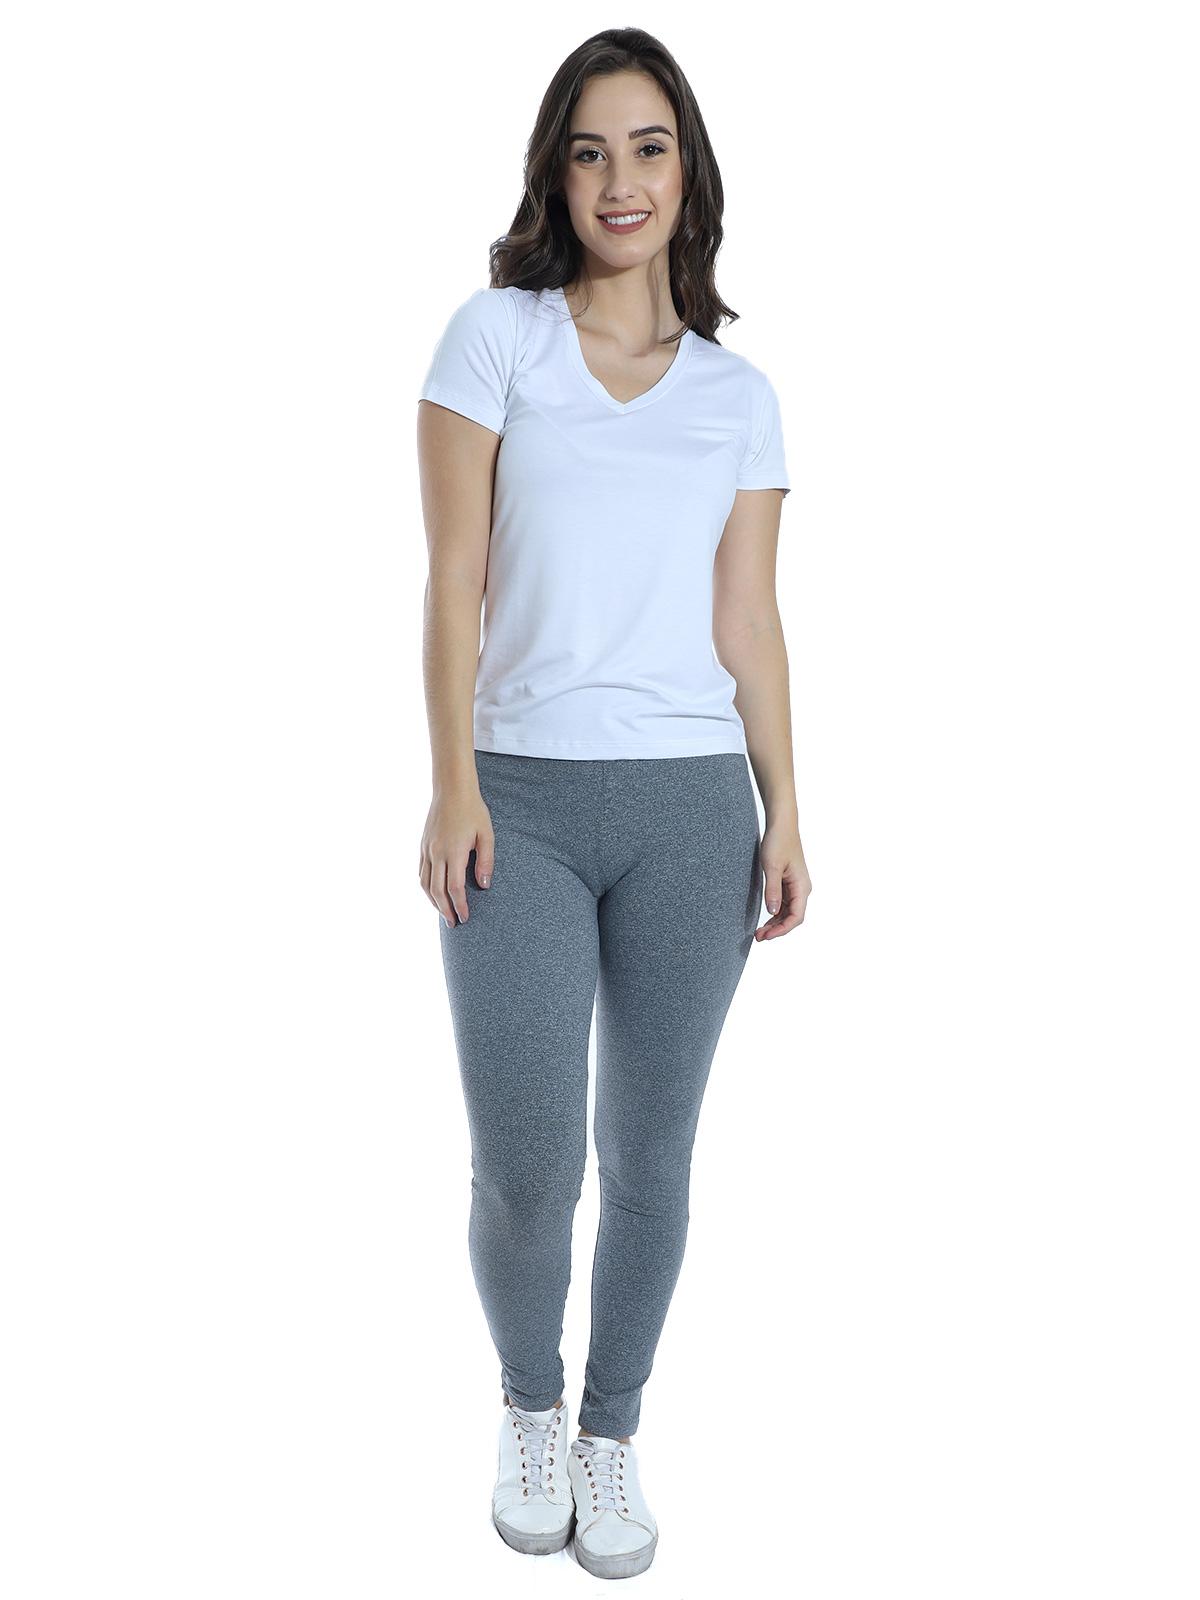 Calça Legging Feminina Cós Anatômico Fitness Academia Mescla